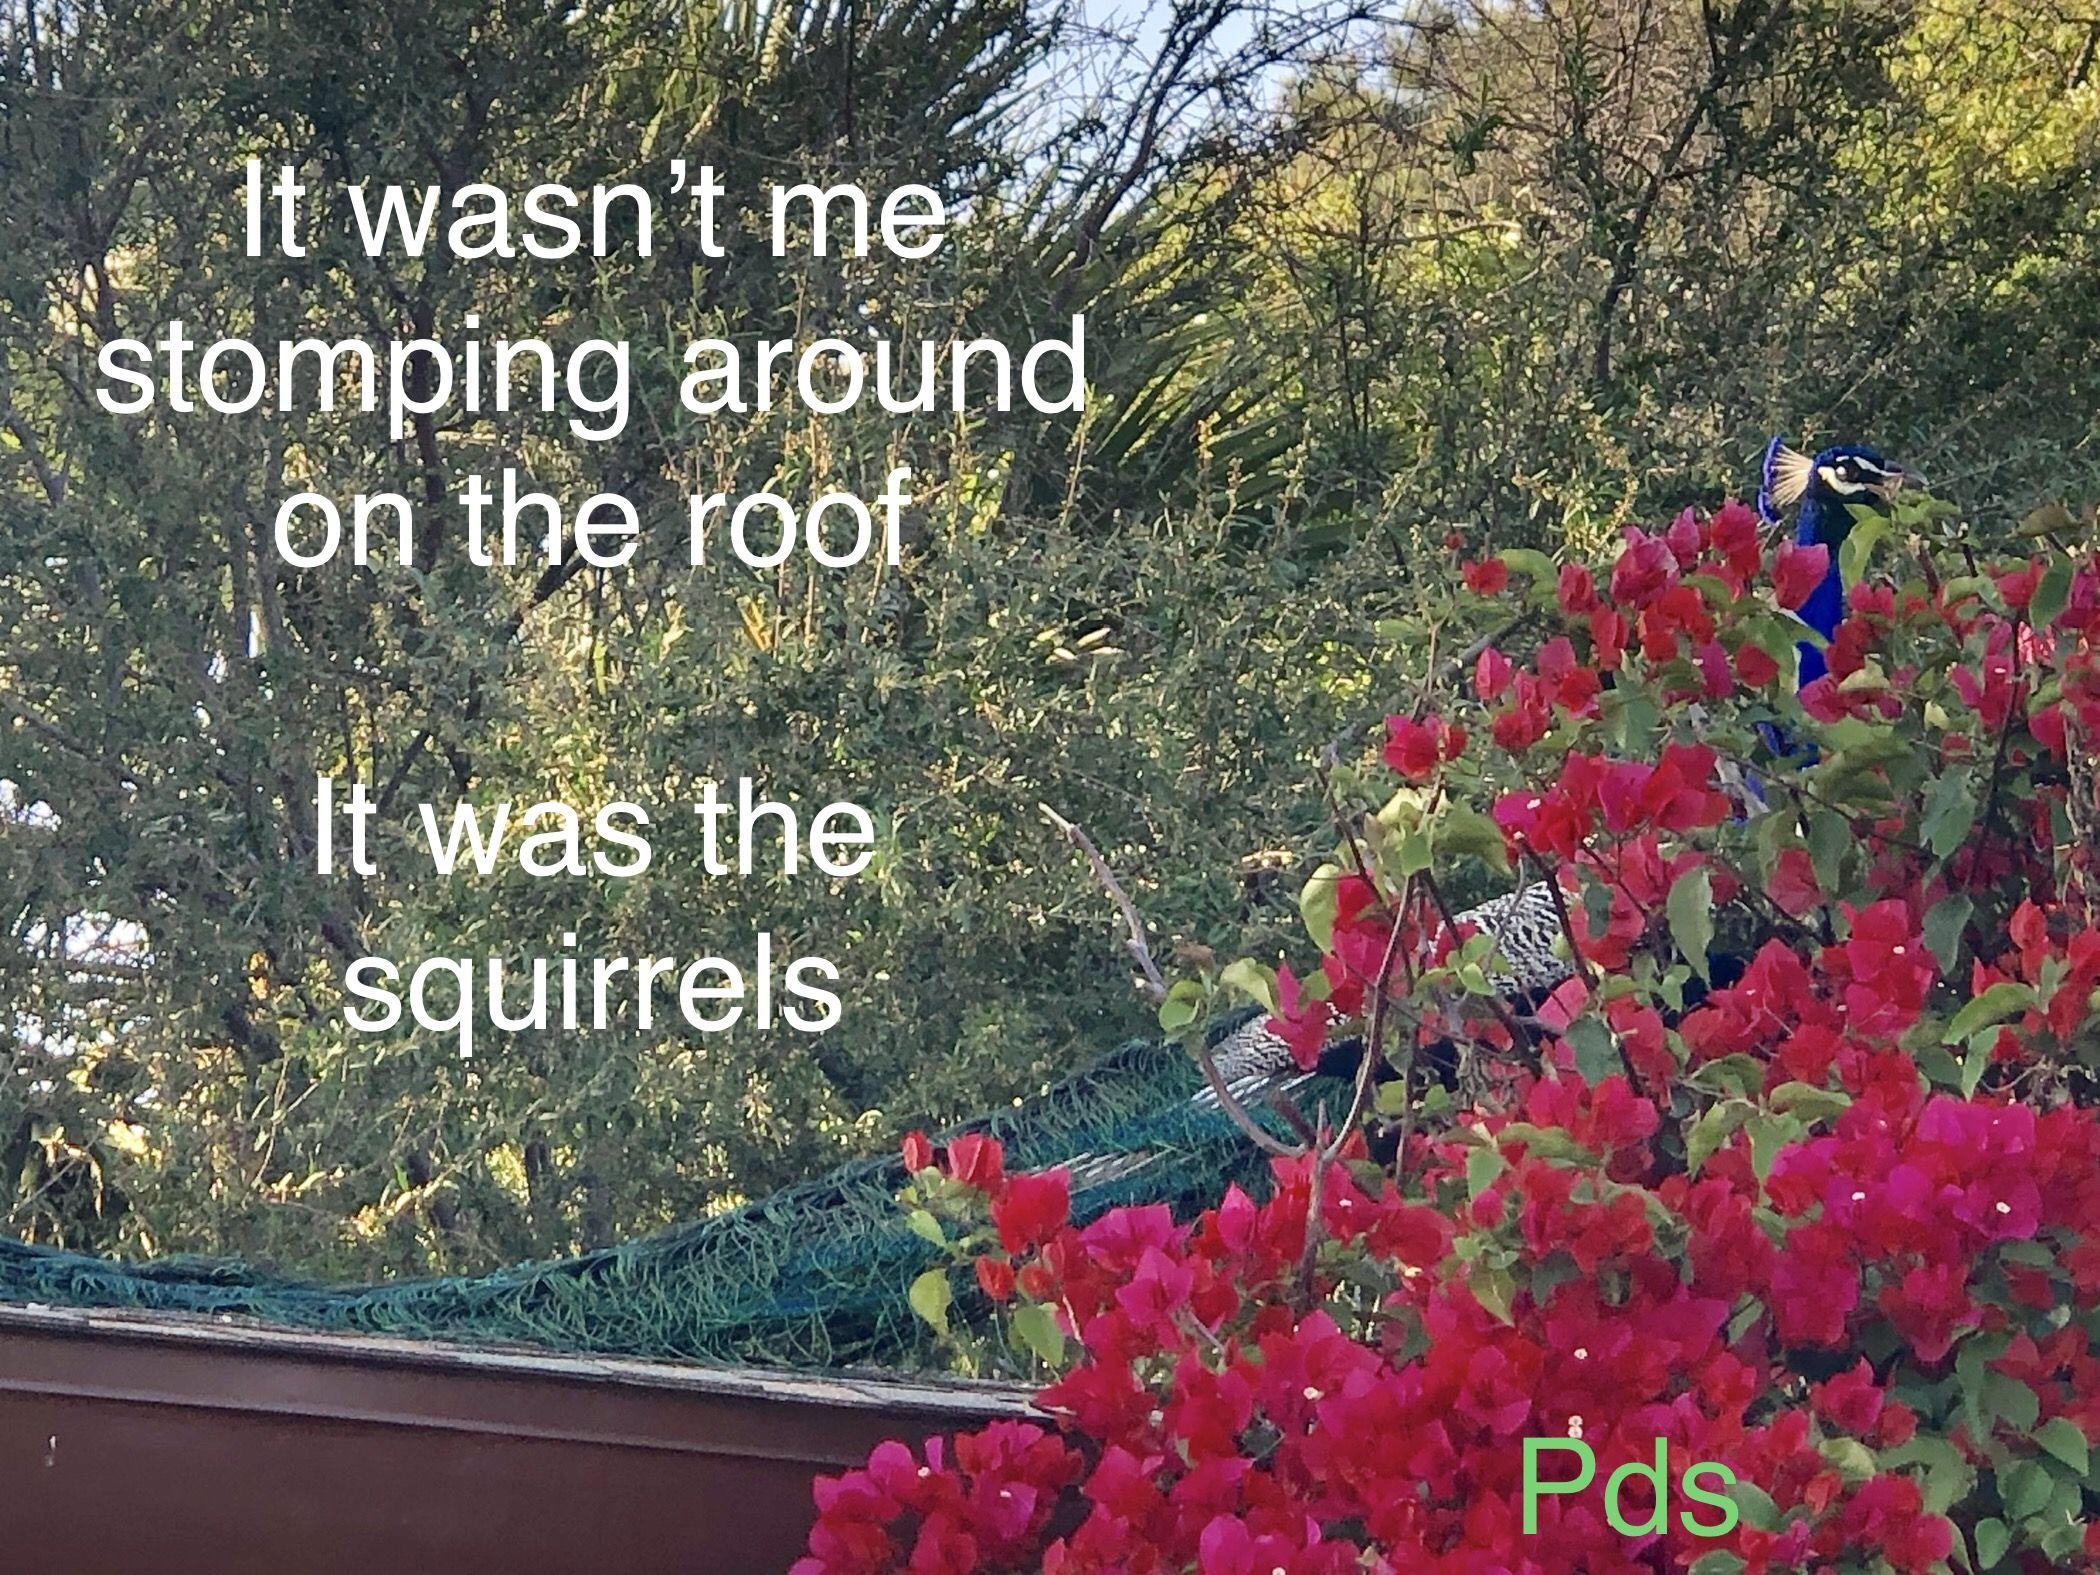 Wild peacock up to no good | Bird meme, Animal memes, Wild